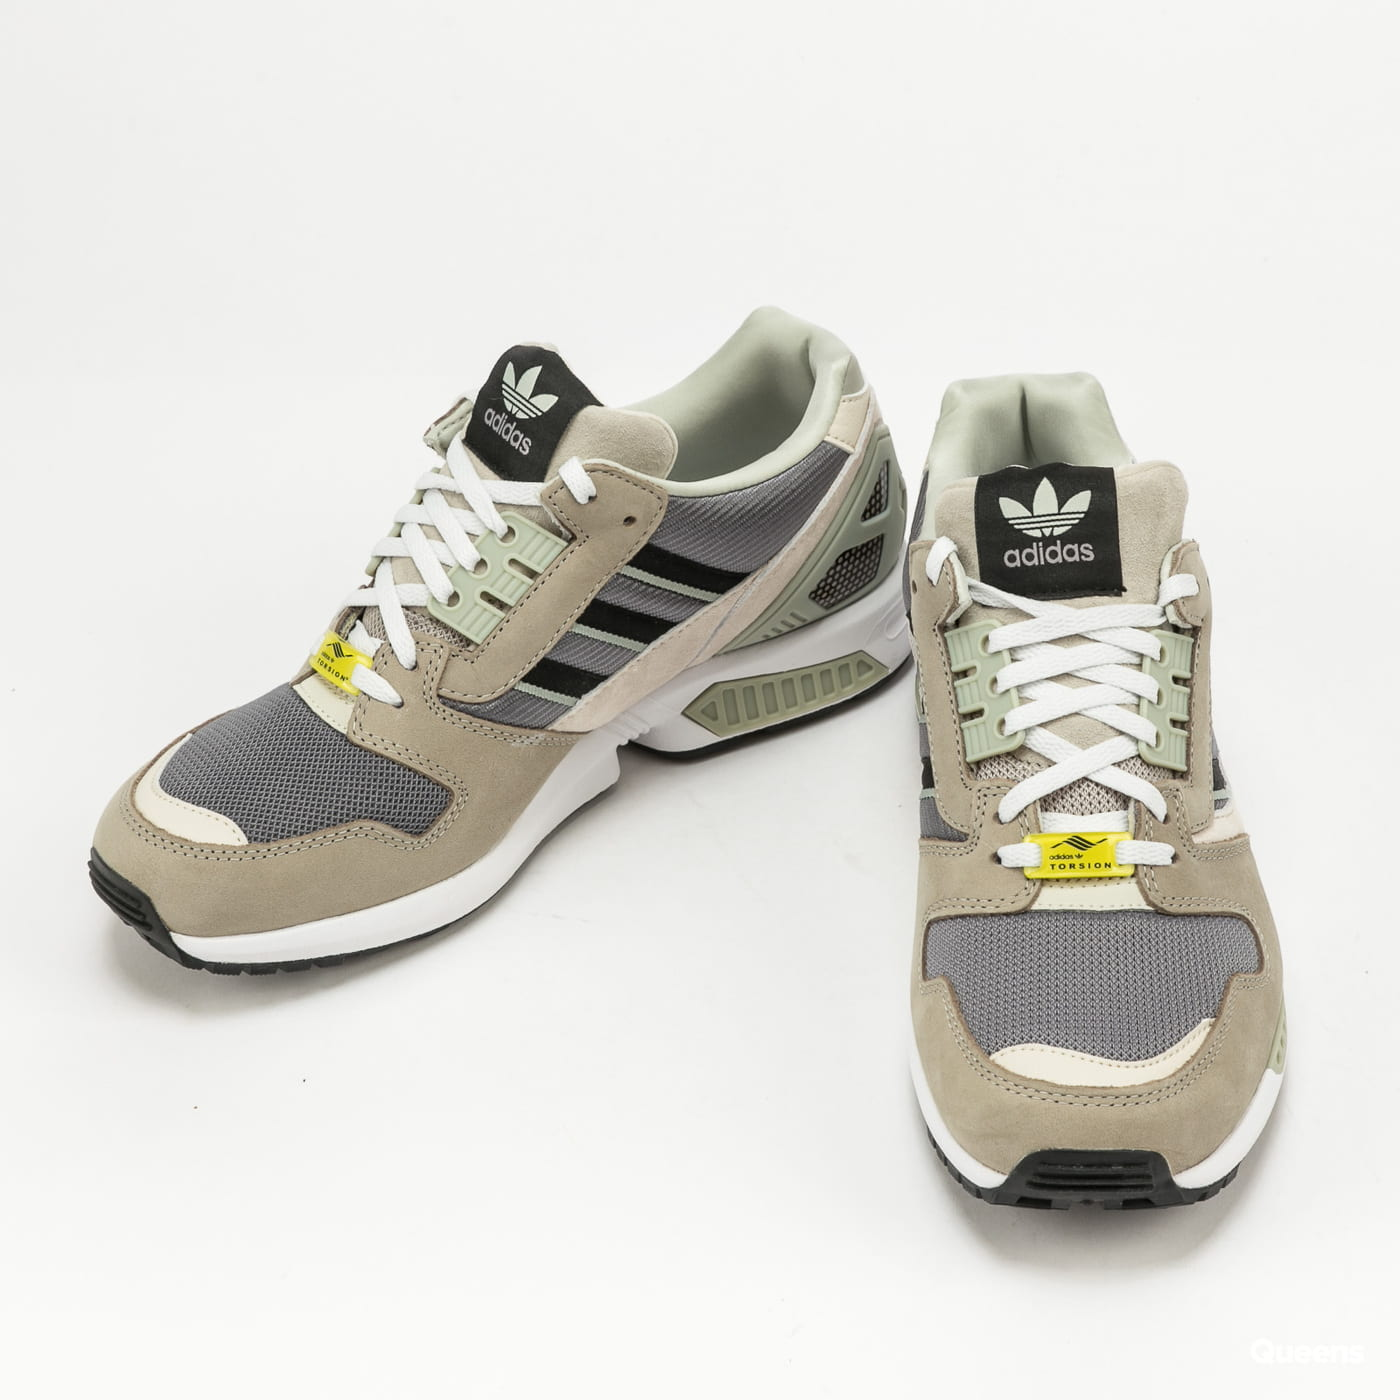 adidas Originals ZX 8000 feagry / cblack / alumin